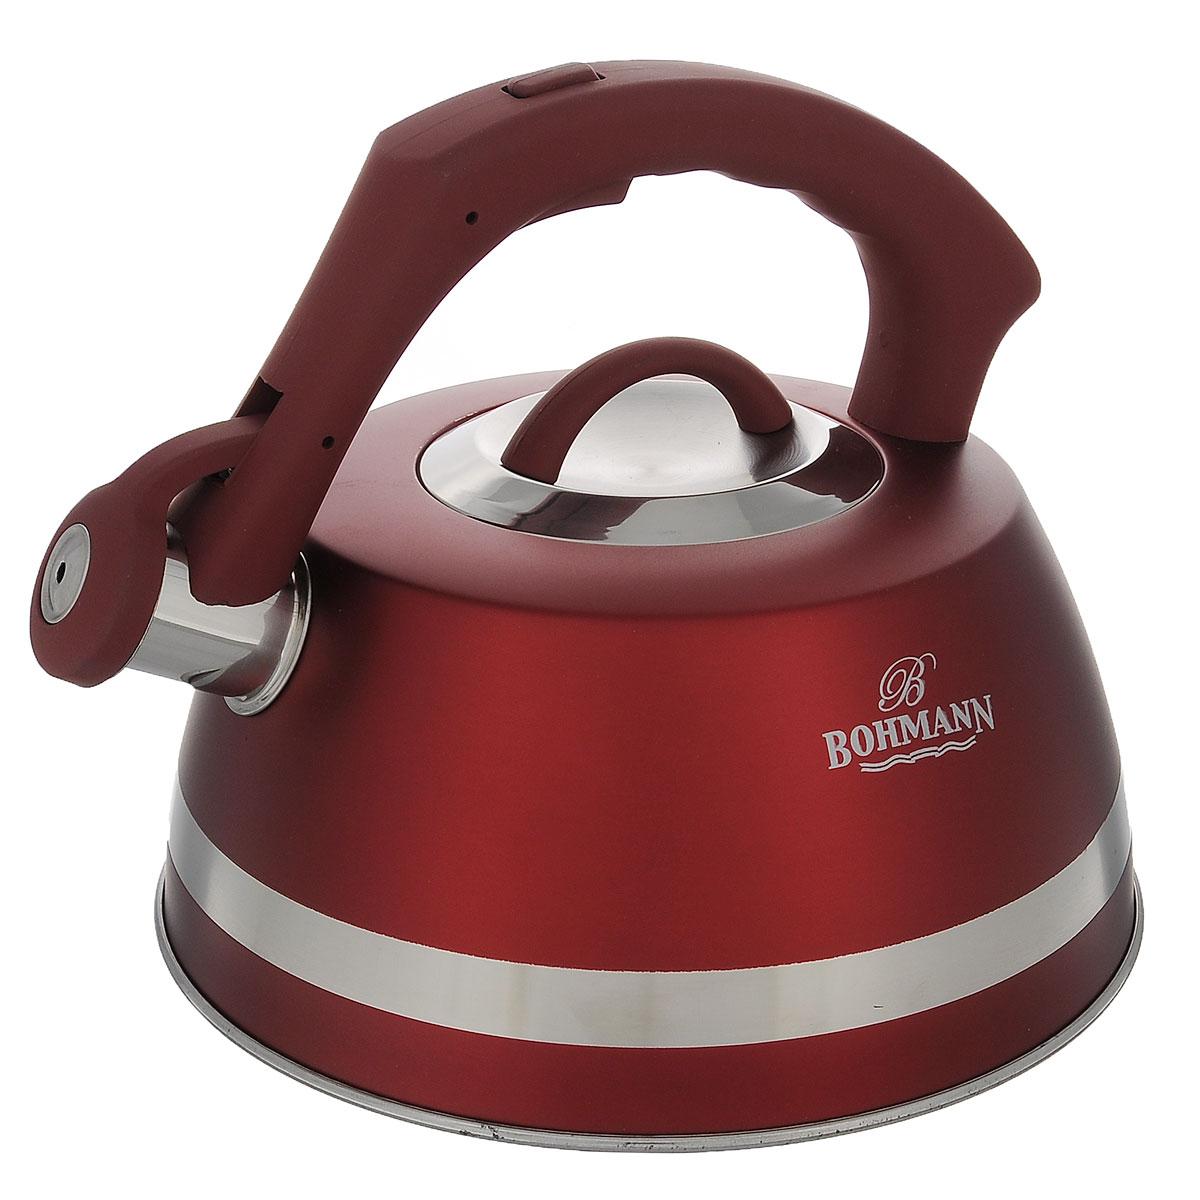 Чайник Bohmann со свистком, цвет: красный, 3,5 л. BH - 9967BH - 9967